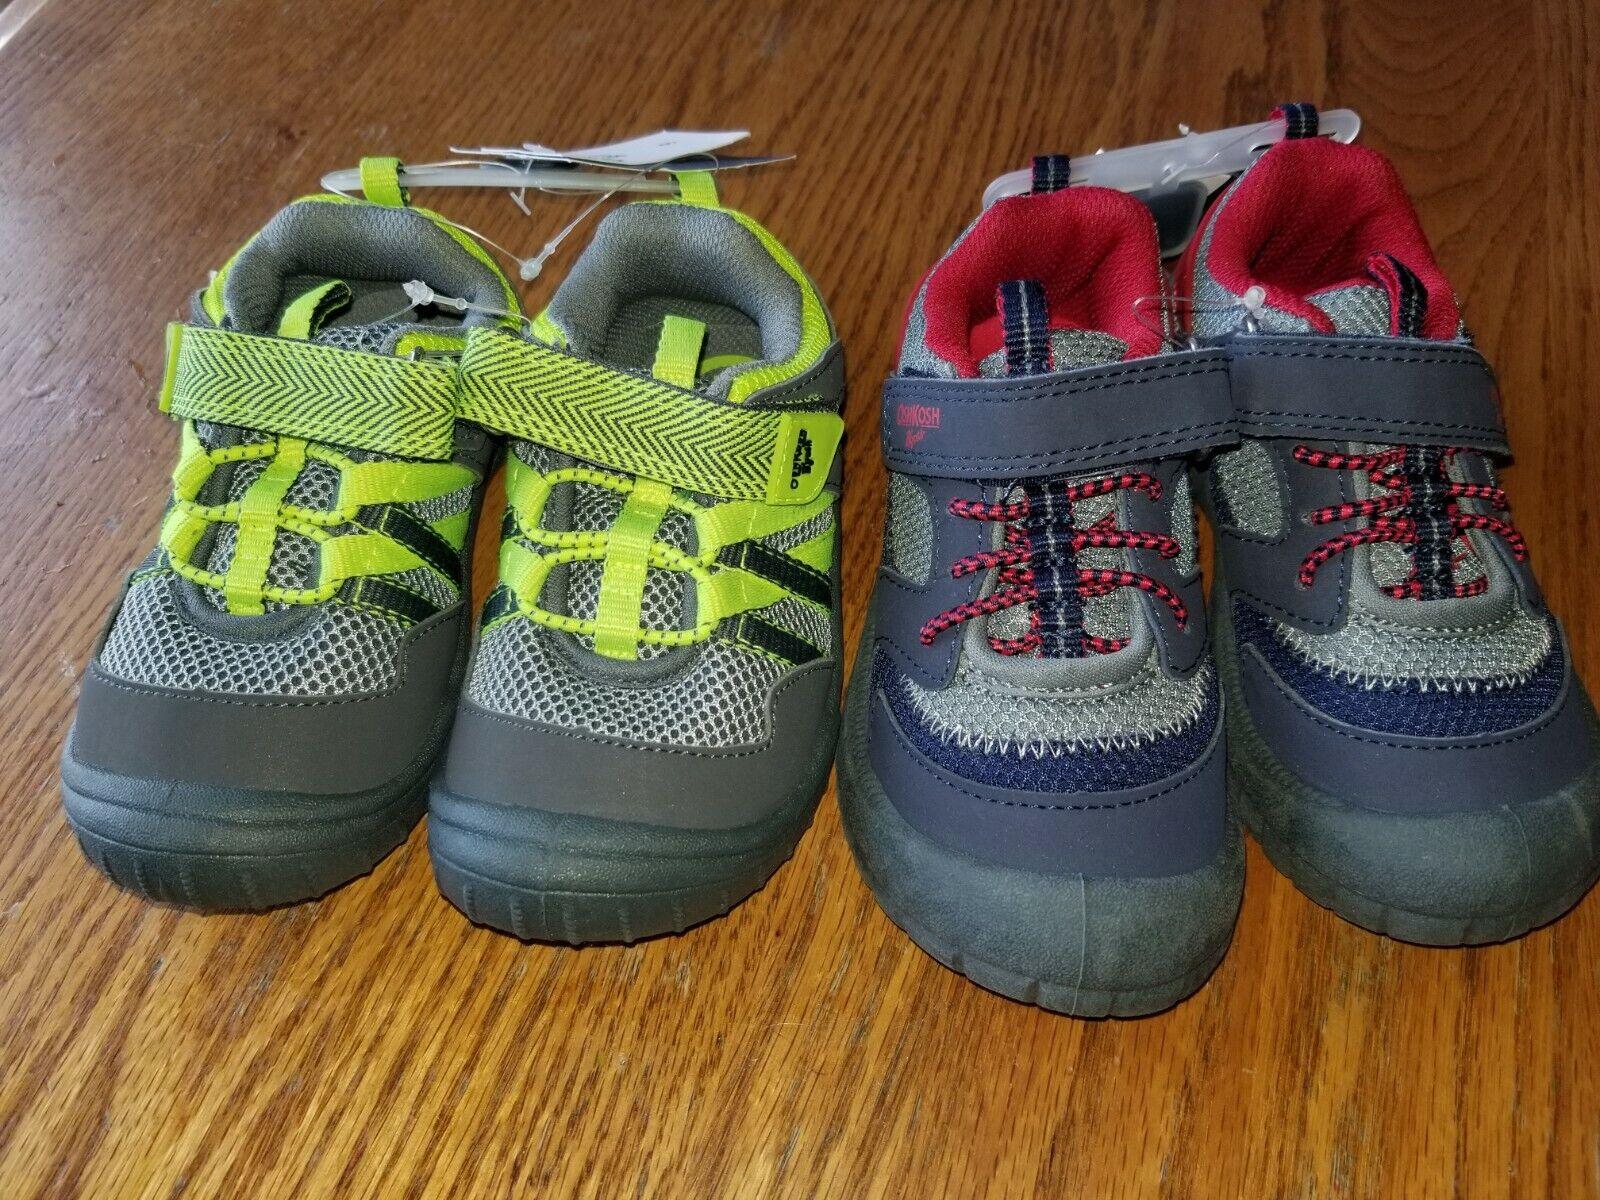 New Boys Oshkosh B'Gosh Shoes Washable Gray Green Blue Red 5